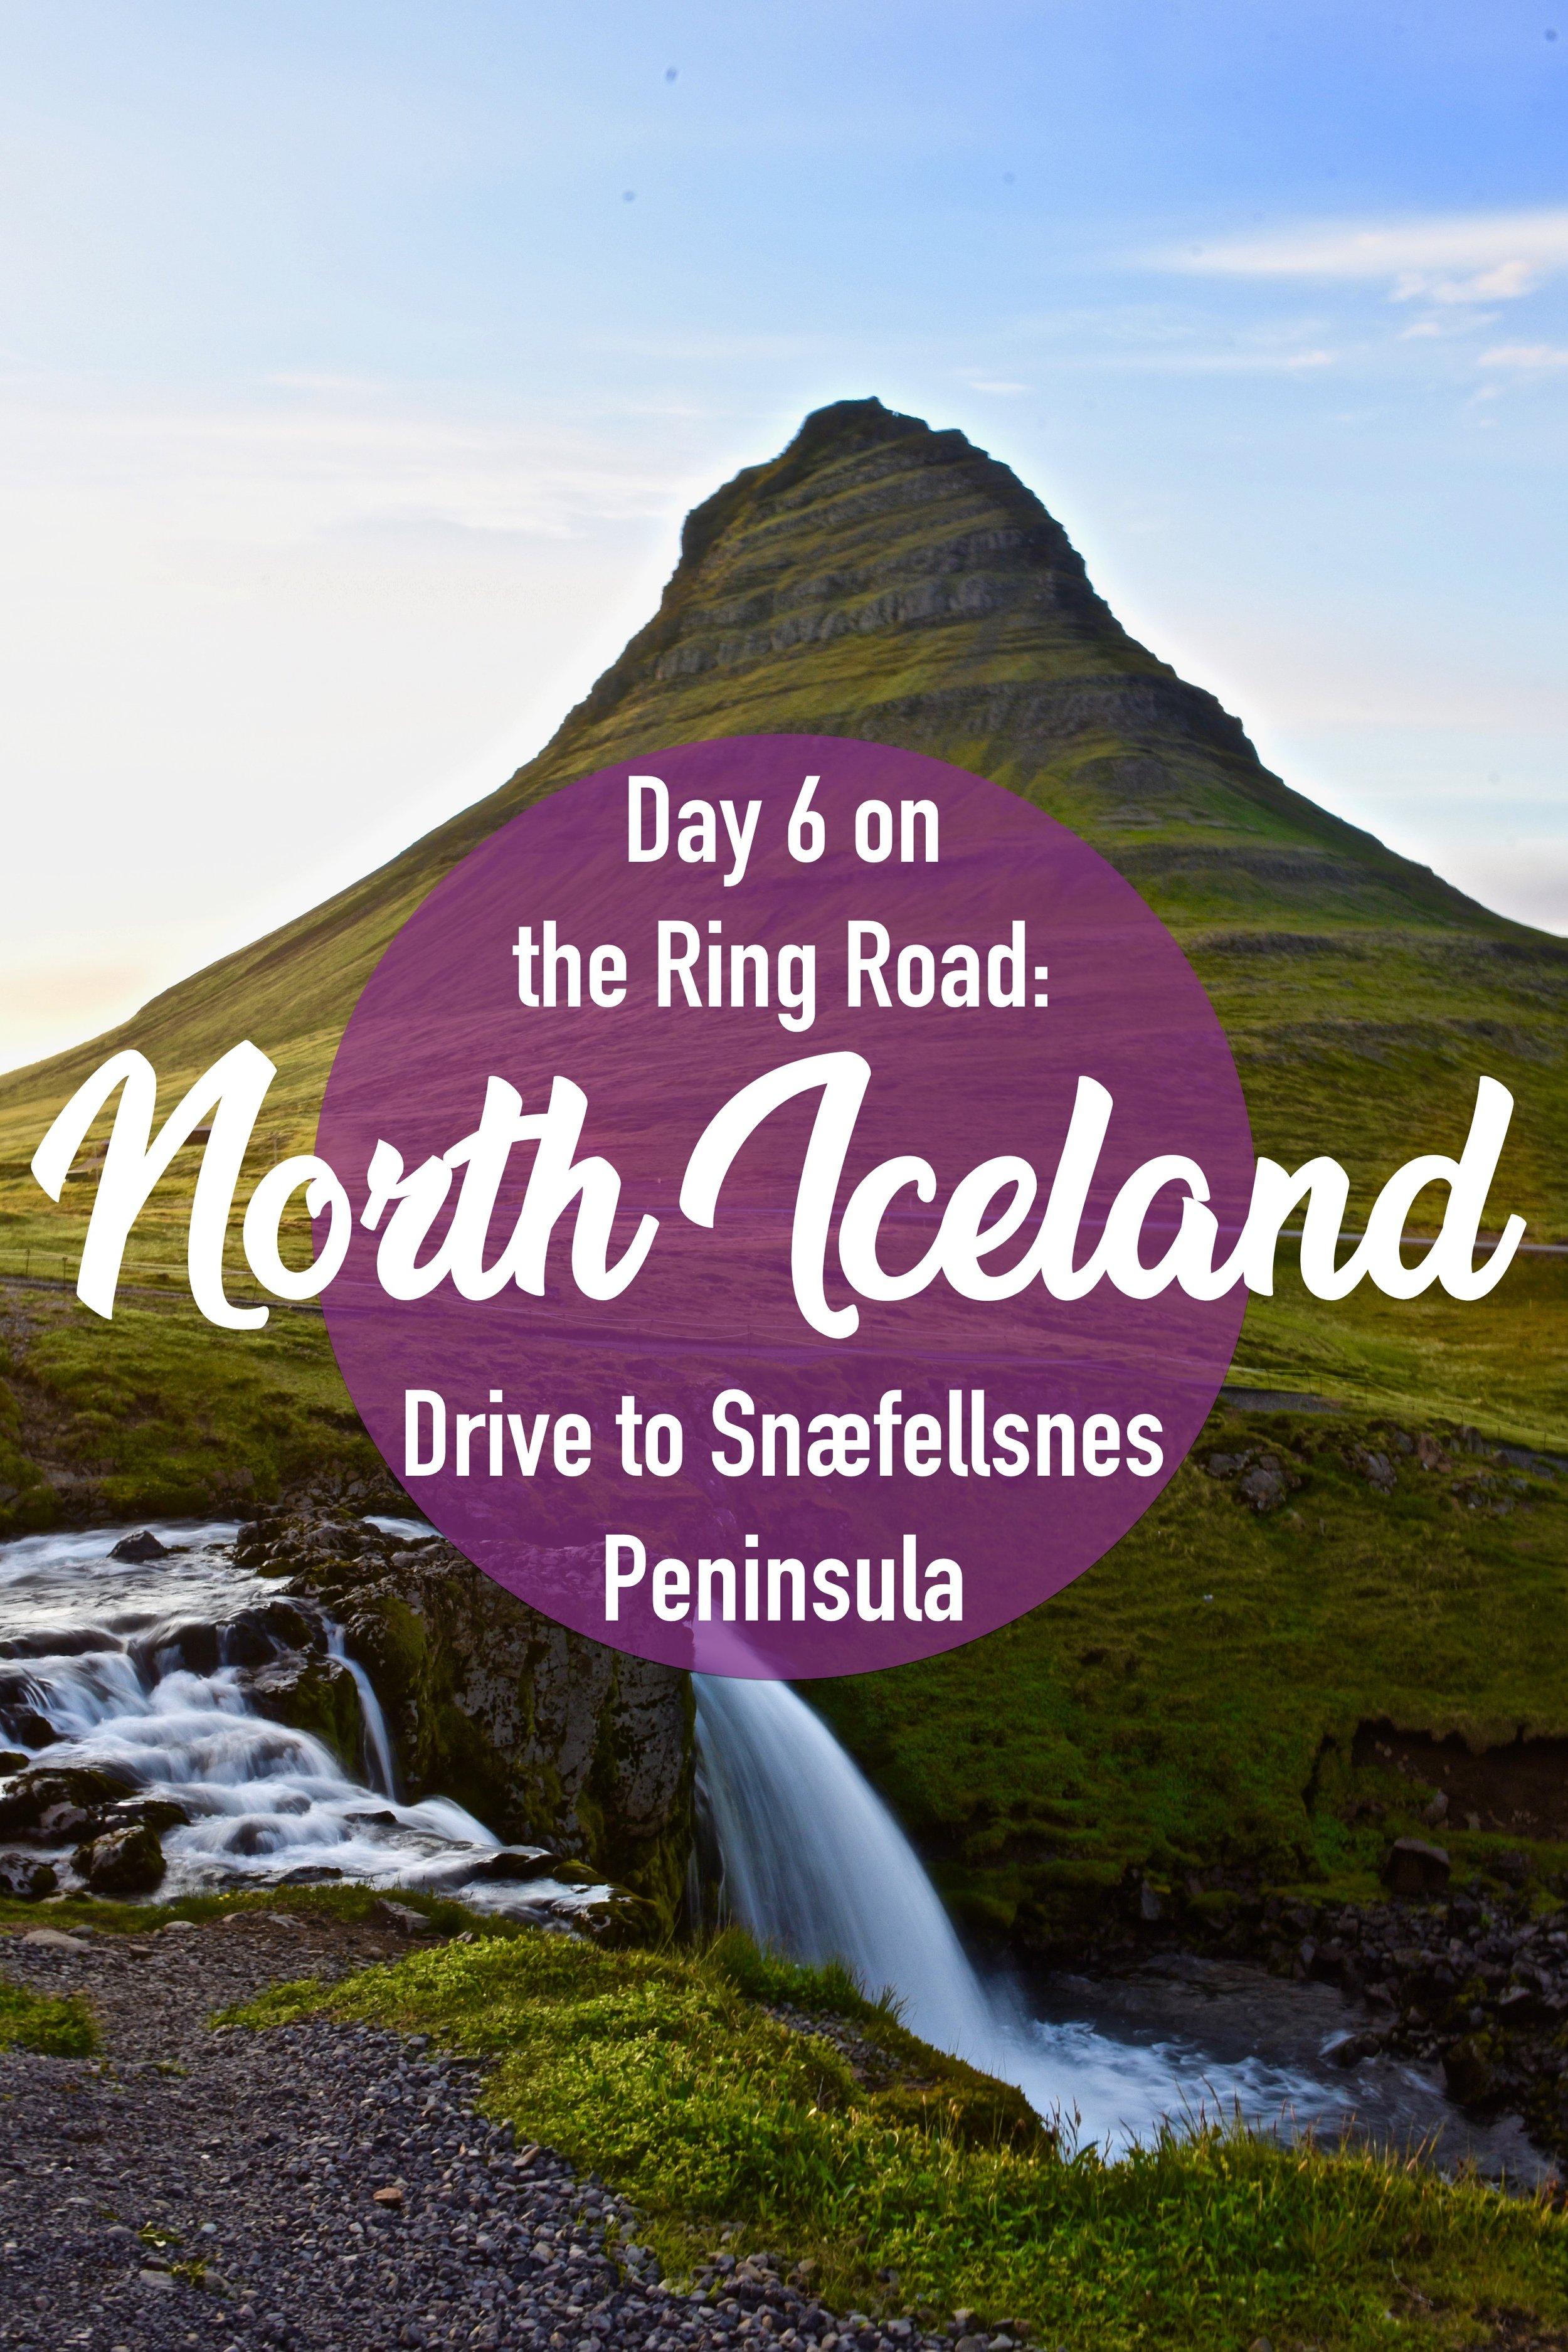 Driving through North Iceland on the Ring Road.  We went from Akureyri to Grundarfjördur to take a detour on the Snæfellsnes Peninsula. #northiceland #snæfellsnes #iceland #ringroad #europe #roadtrip #kirkjufell